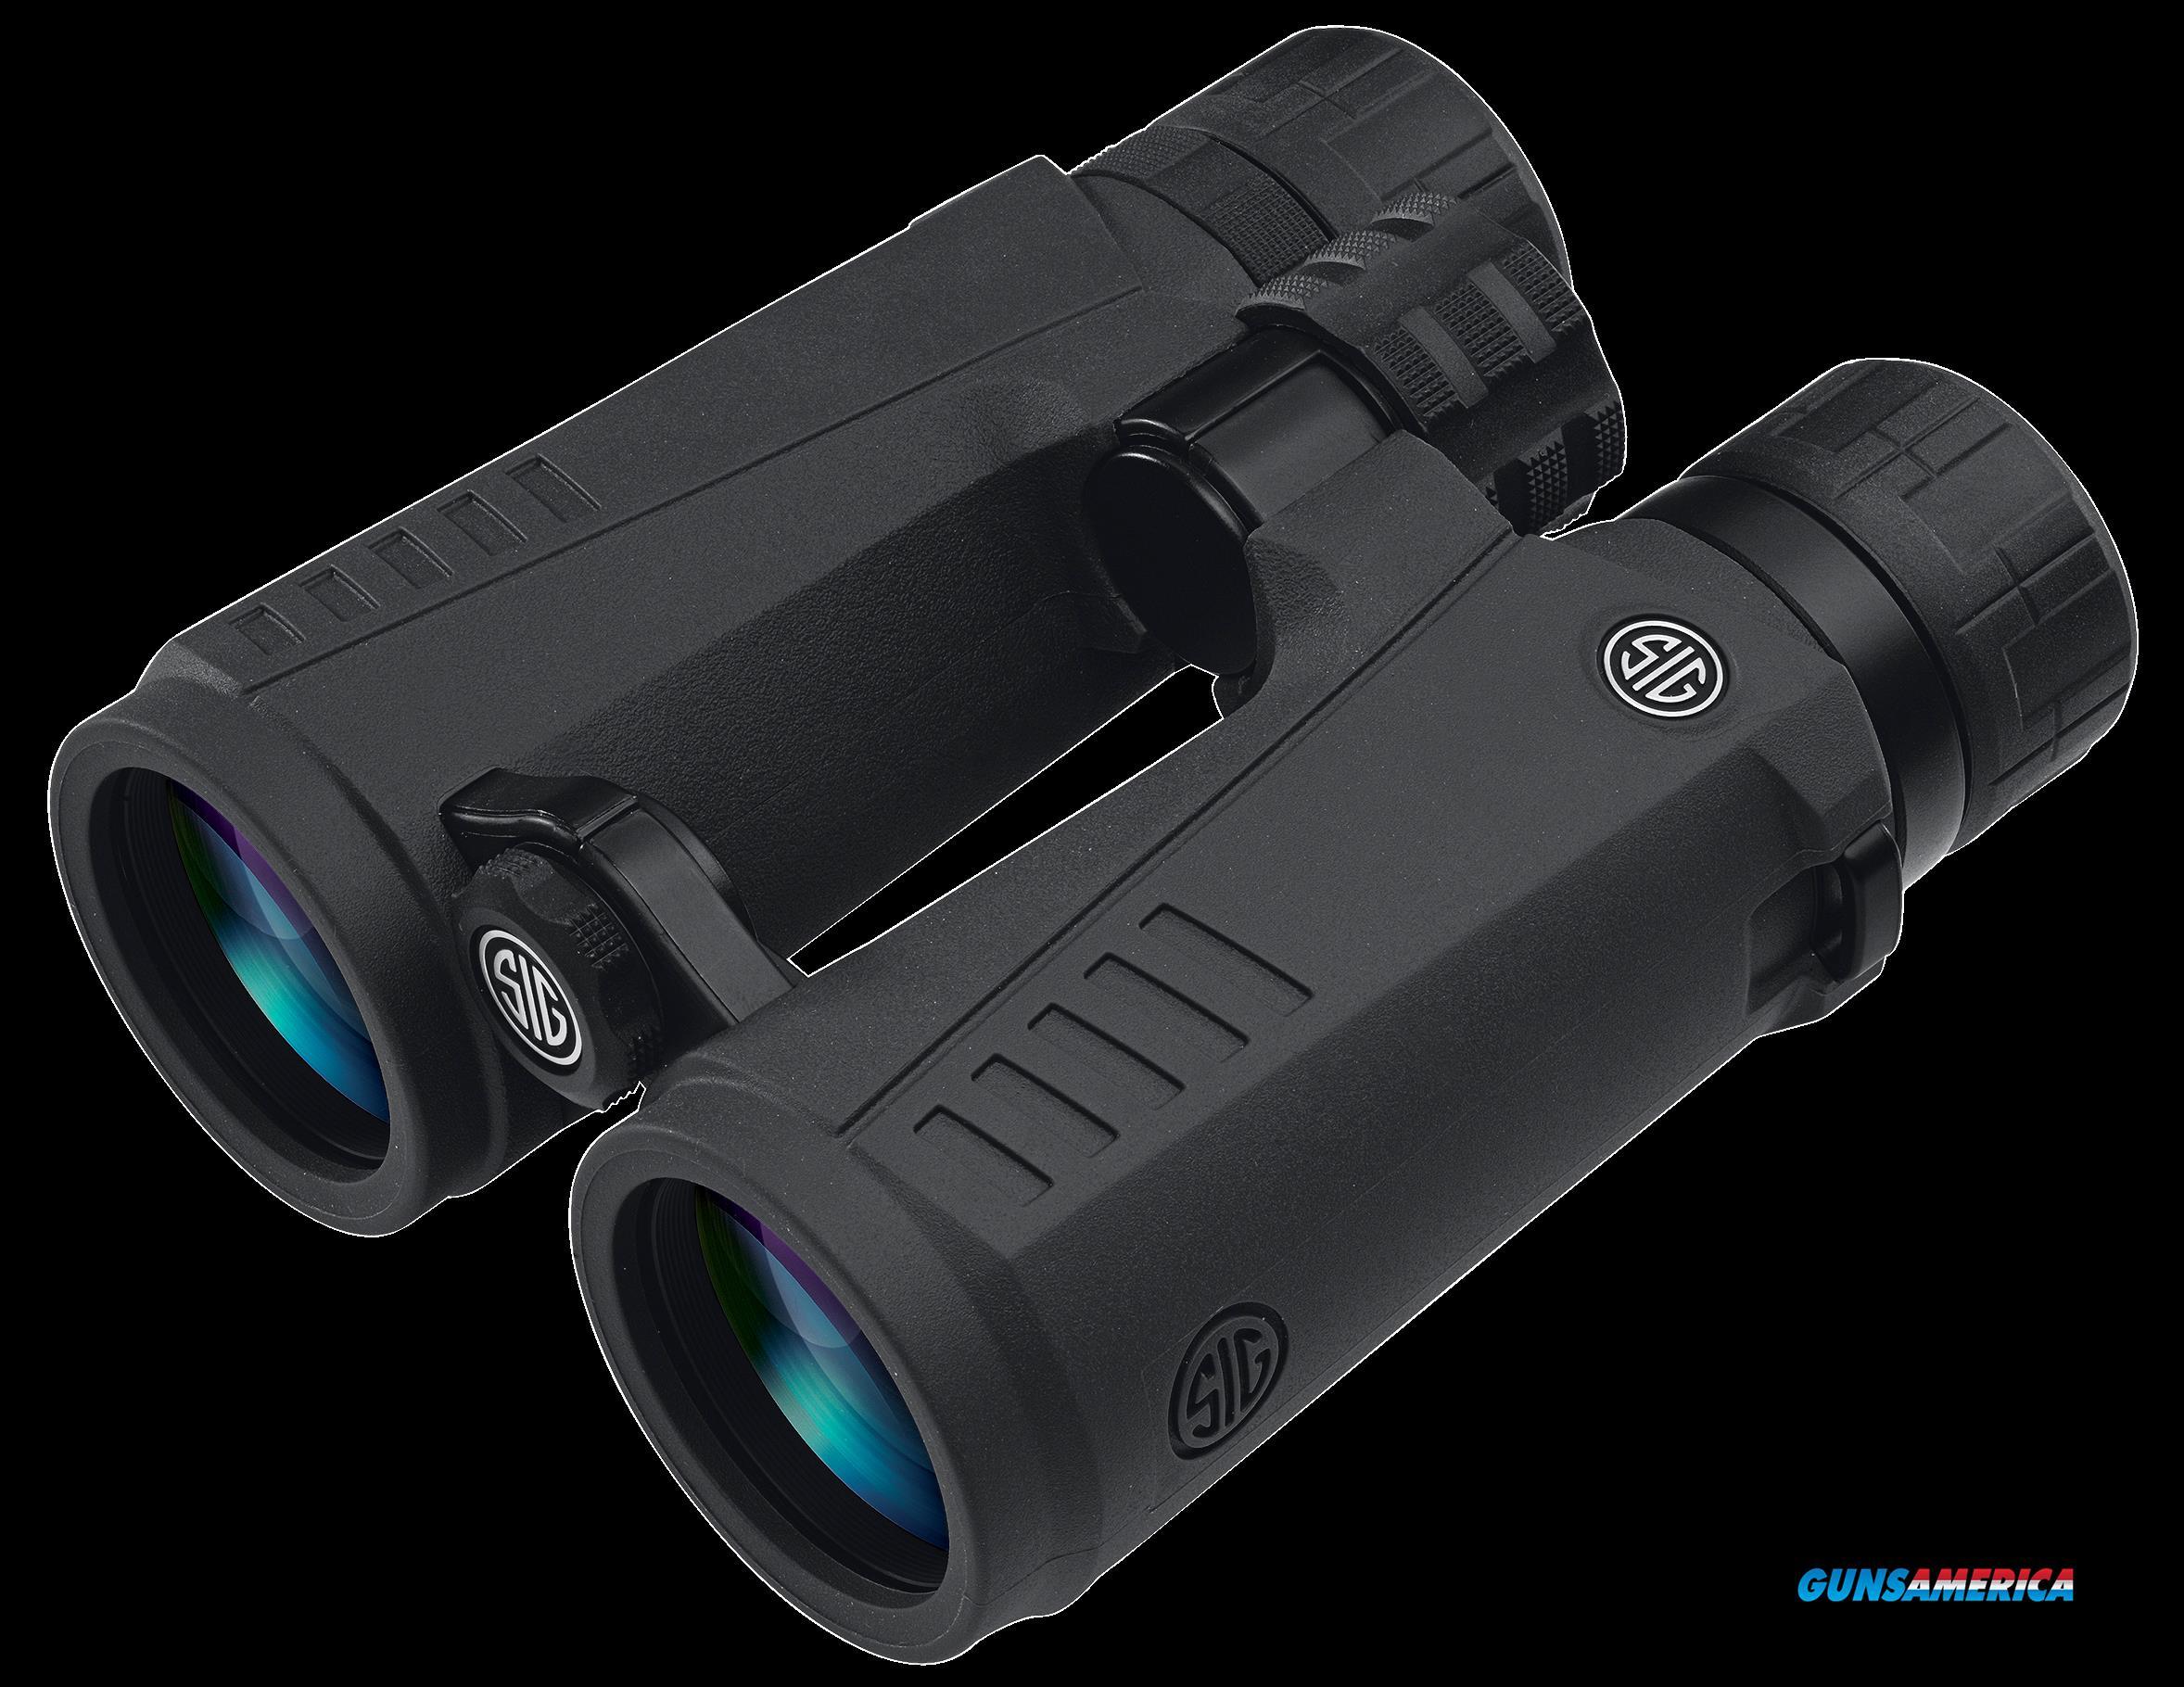 Sig Sauer Electro-optics Zulu5, Sig Soz52121  Zulu5  Open  Bridge 12x50  Guns > Pistols > 1911 Pistol Copies (non-Colt)